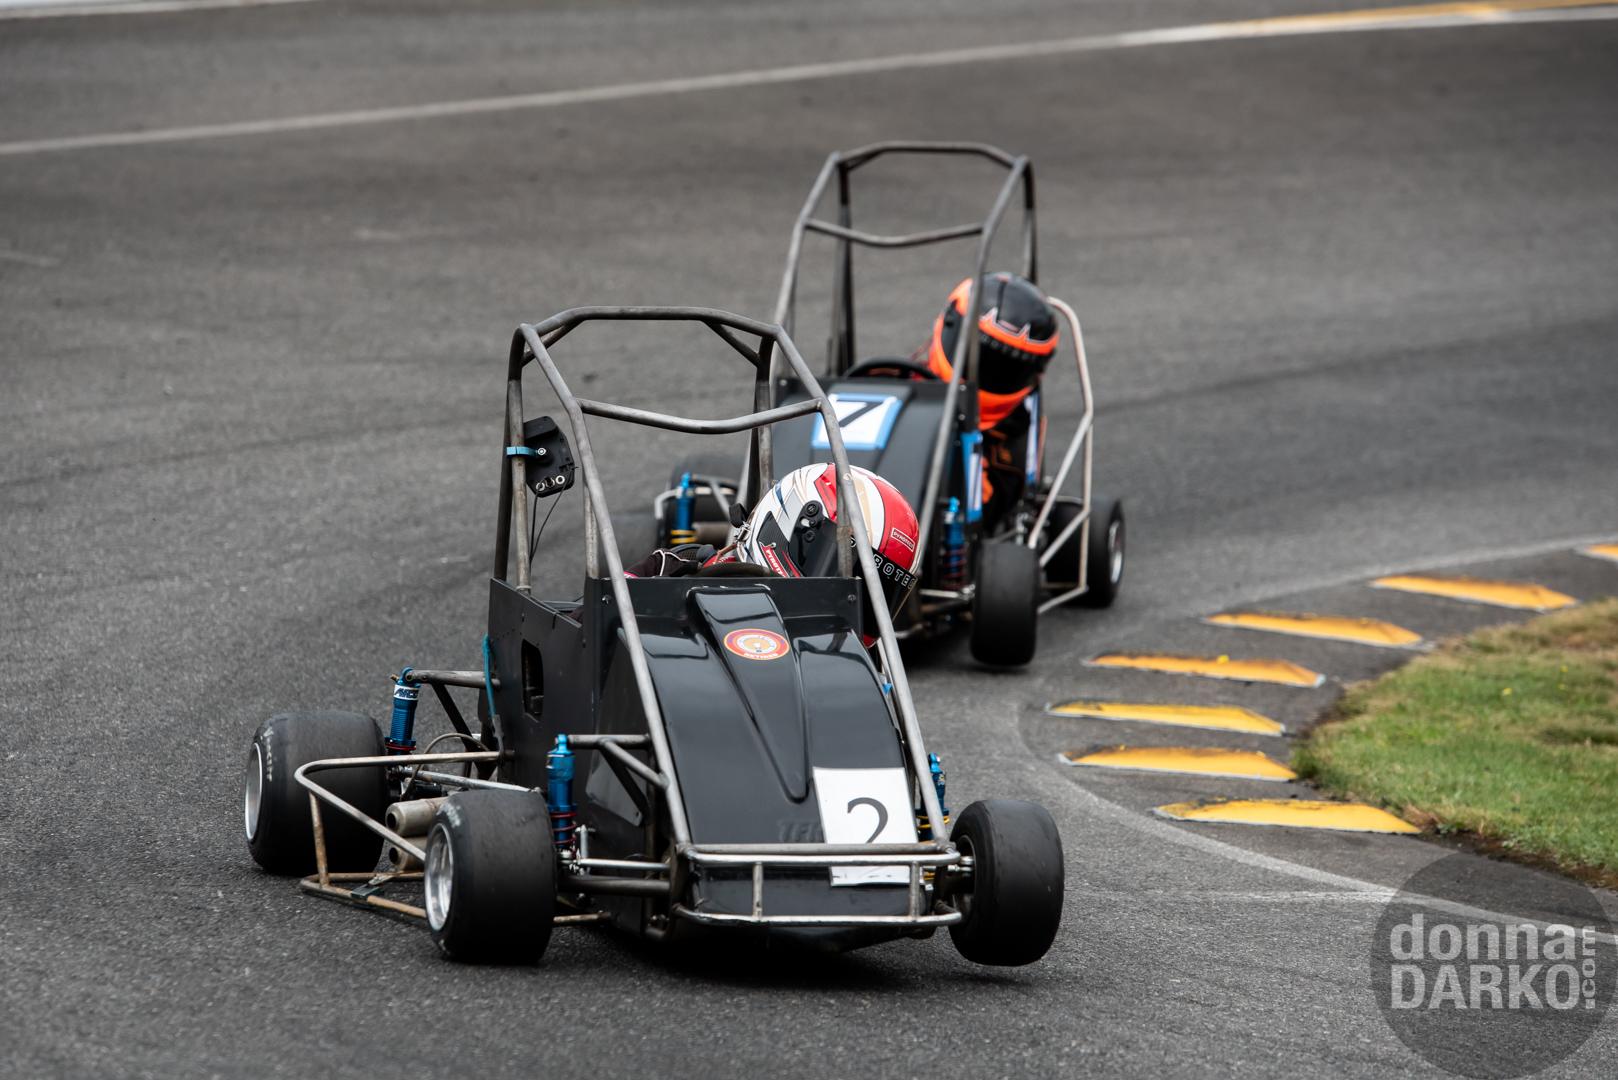 QWMA (Racing) 8-11-2019 DSC_7318.jpg